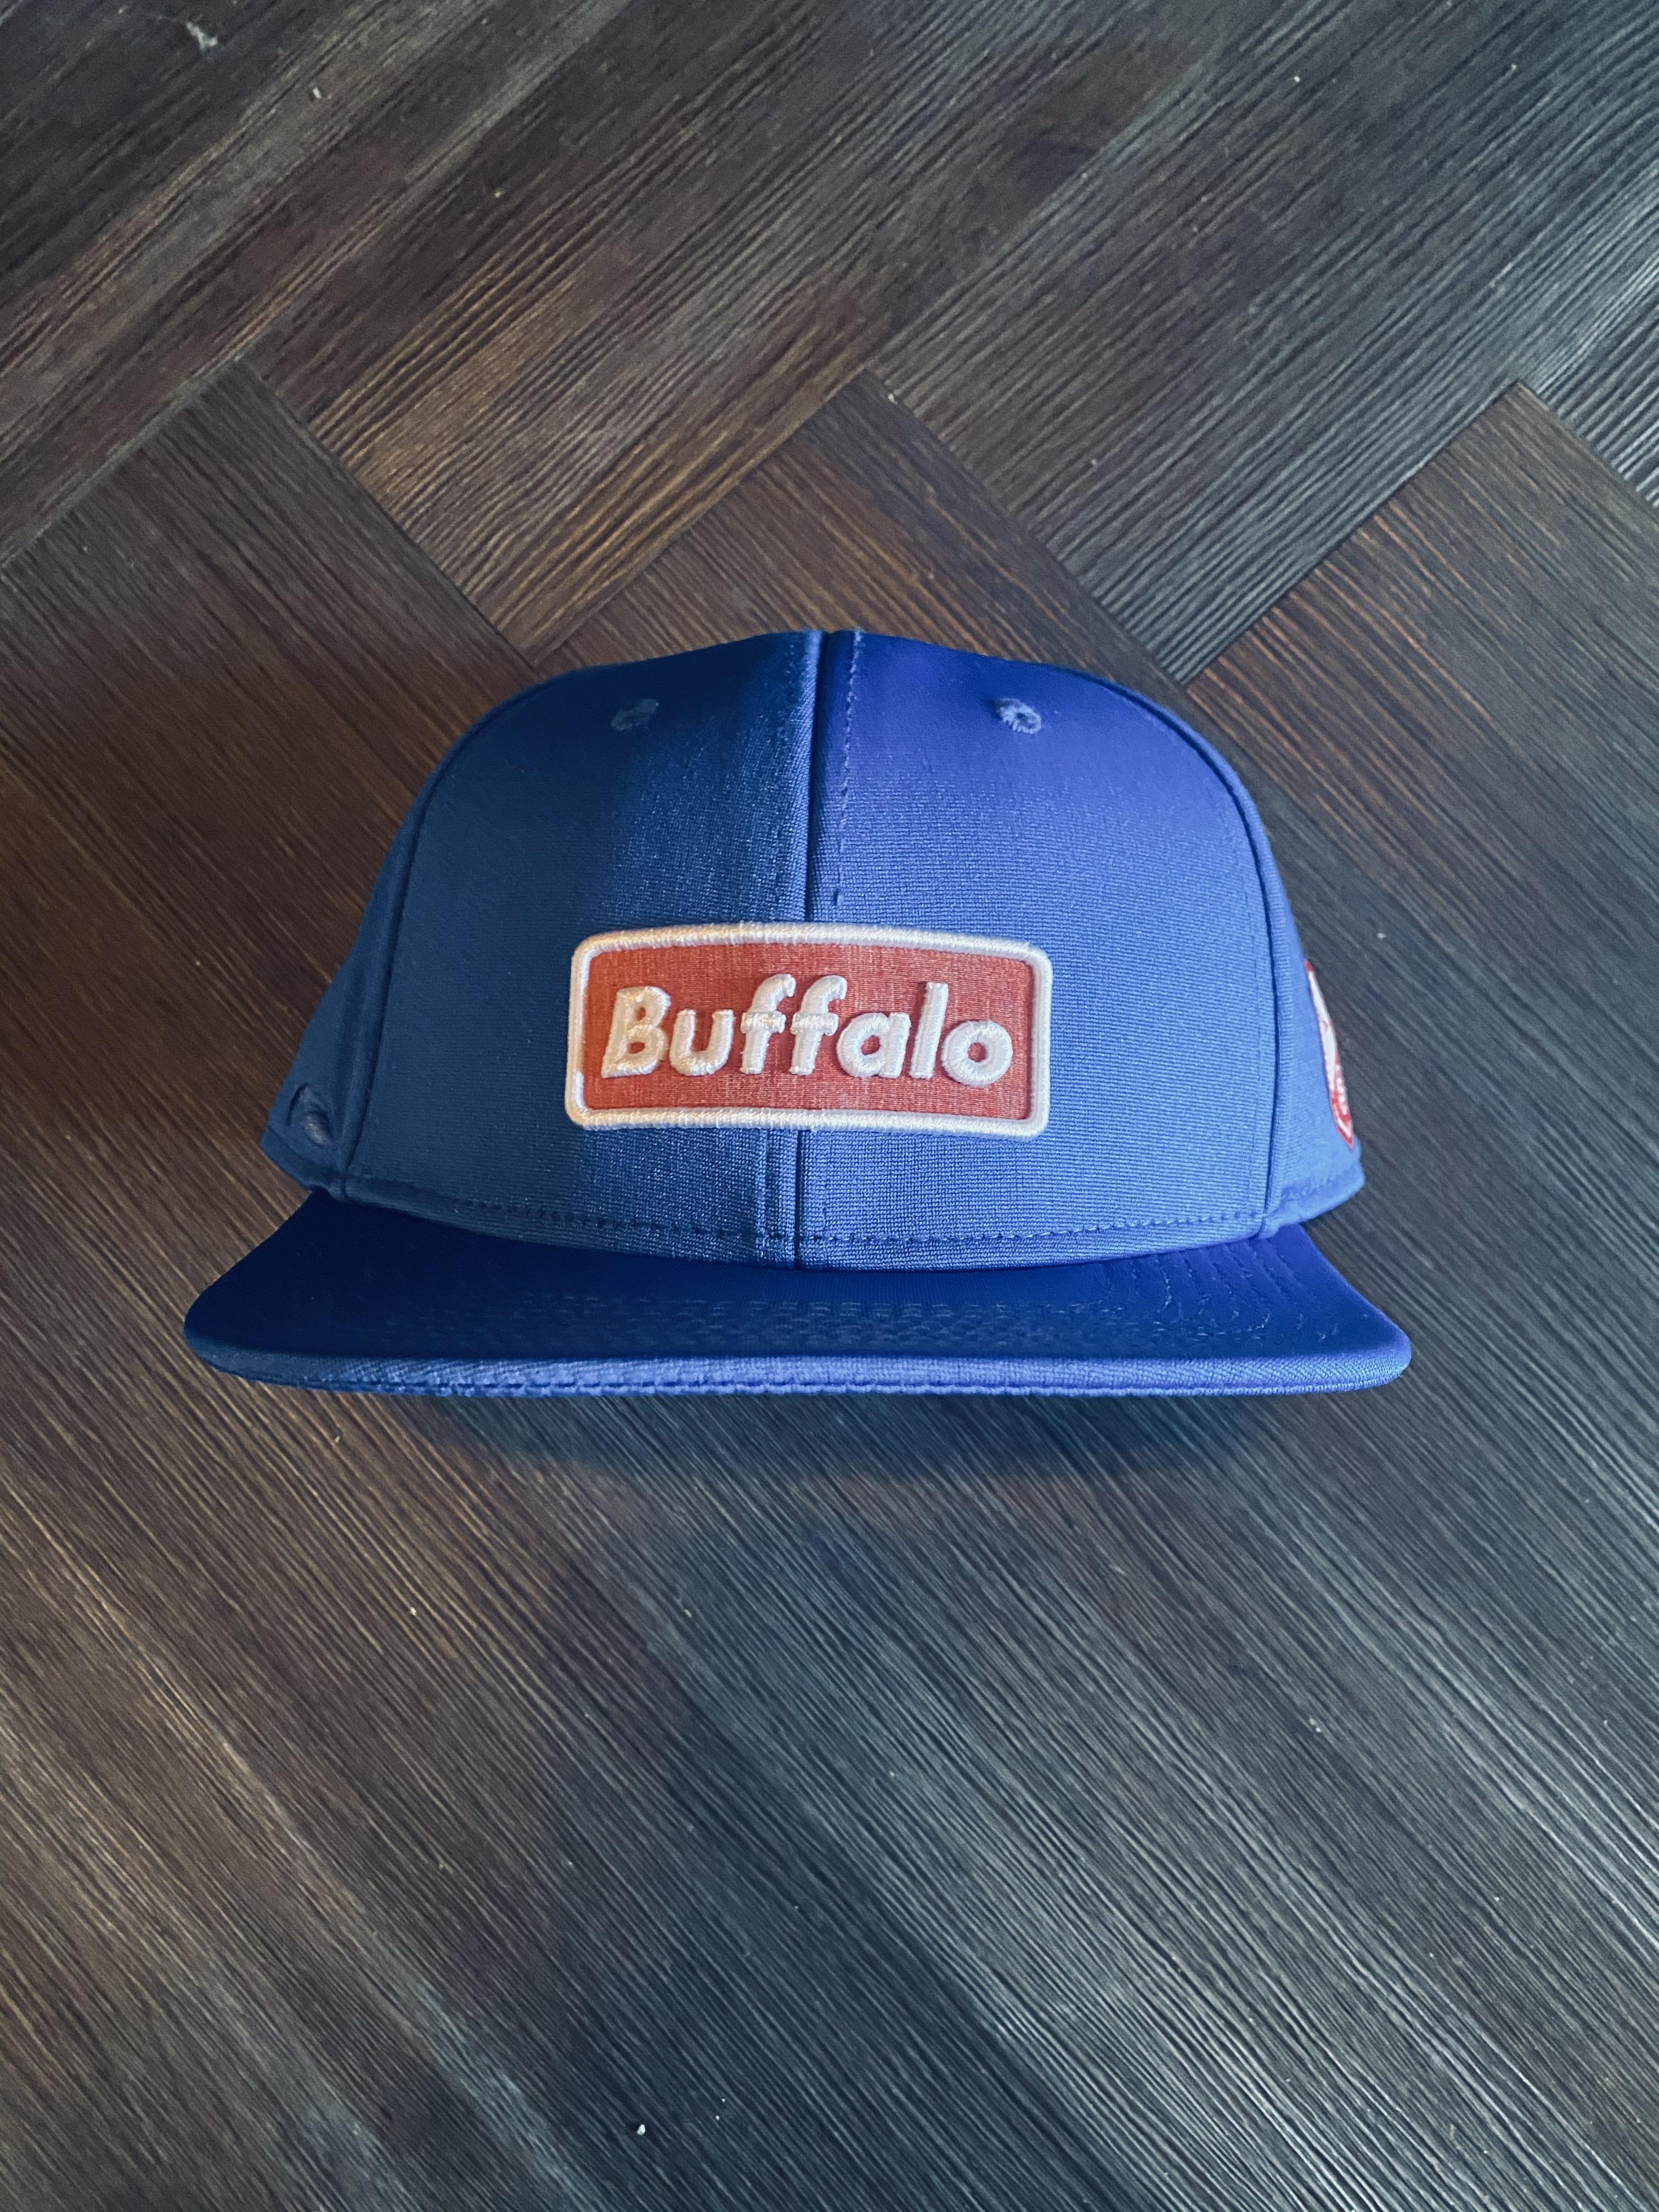 Buffalo Supreme Hat (Royal)